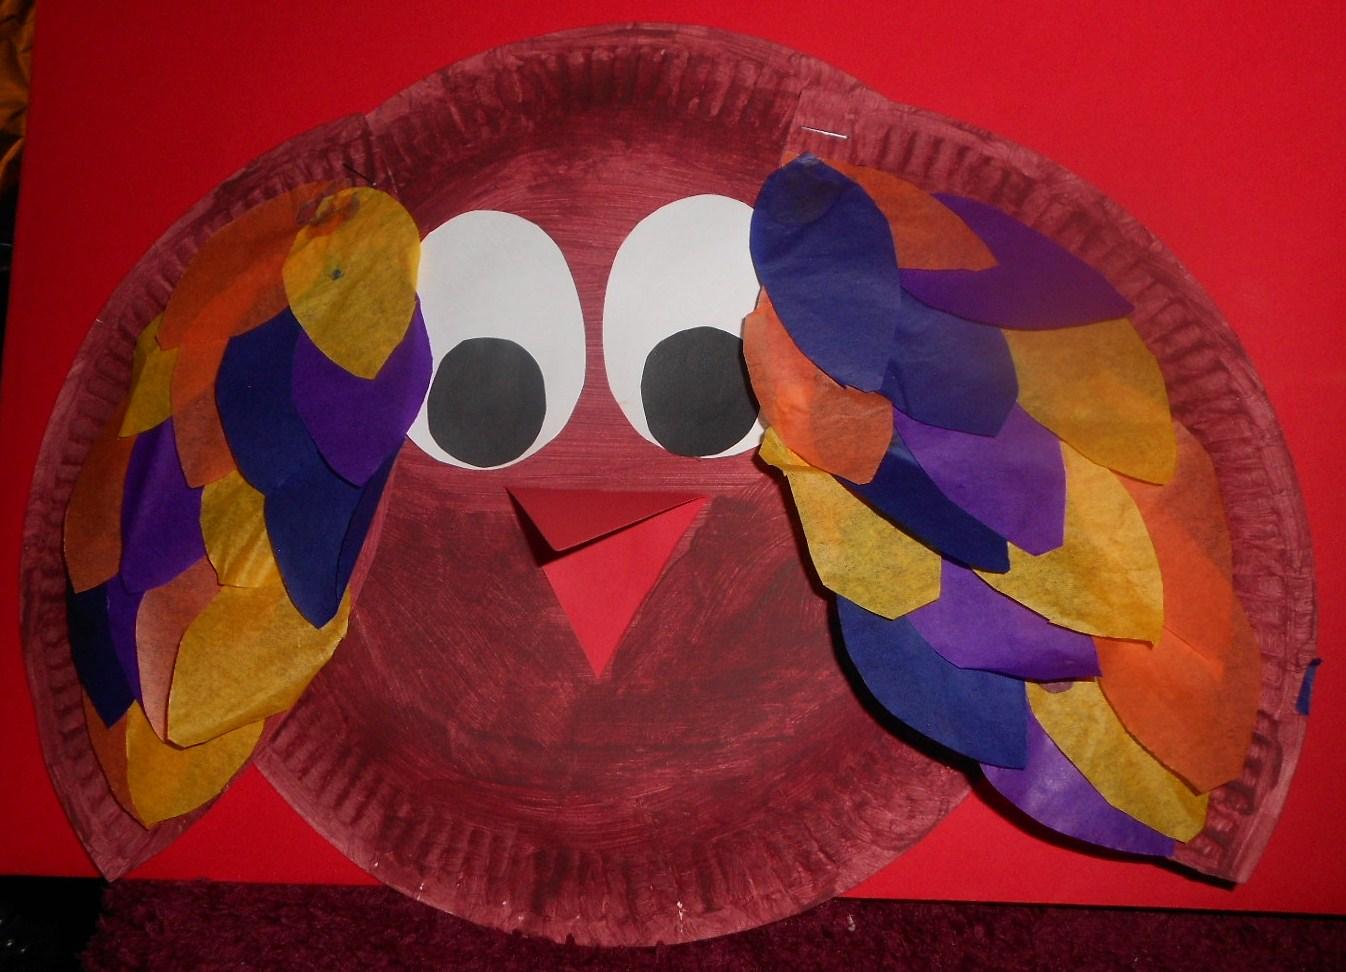 Paper Plate Bird & Jamesu0026May Arts and Crafts Blog: Paper Plate Bird